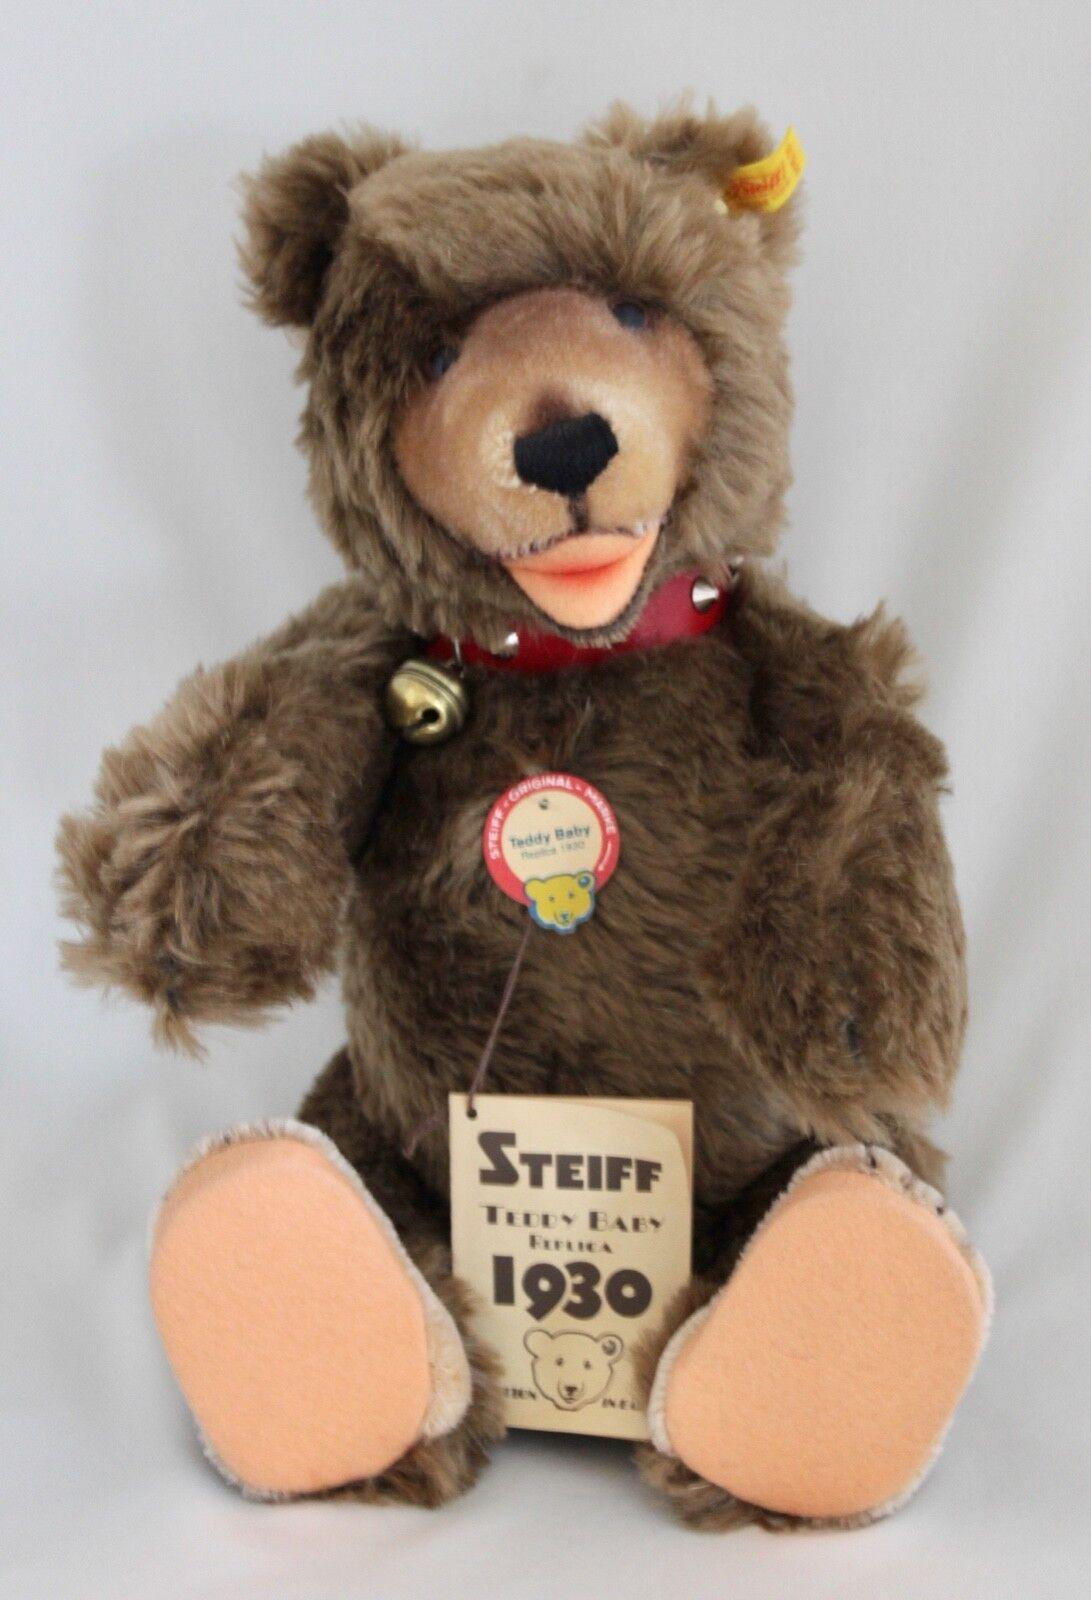 Steiff Teddy Baby Replica 1930 marrone Bear 14  EAN 0175/35 - PERFECT